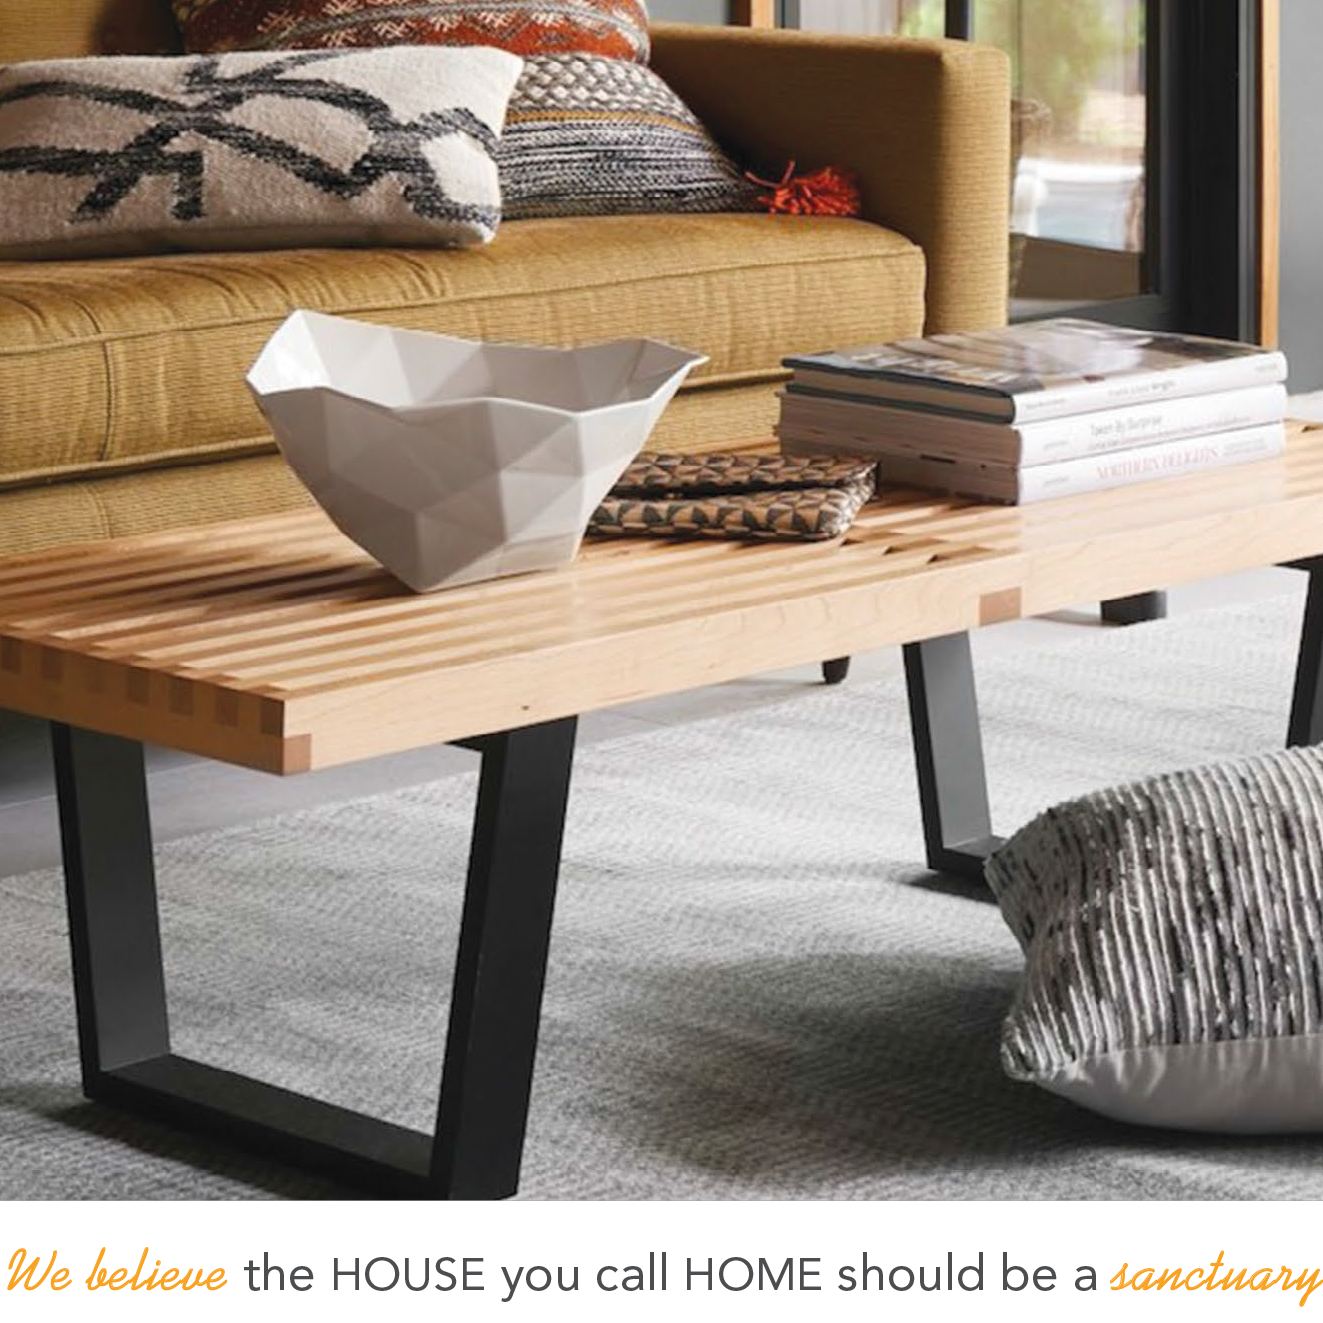 bend furniture & design — kristin cahalane